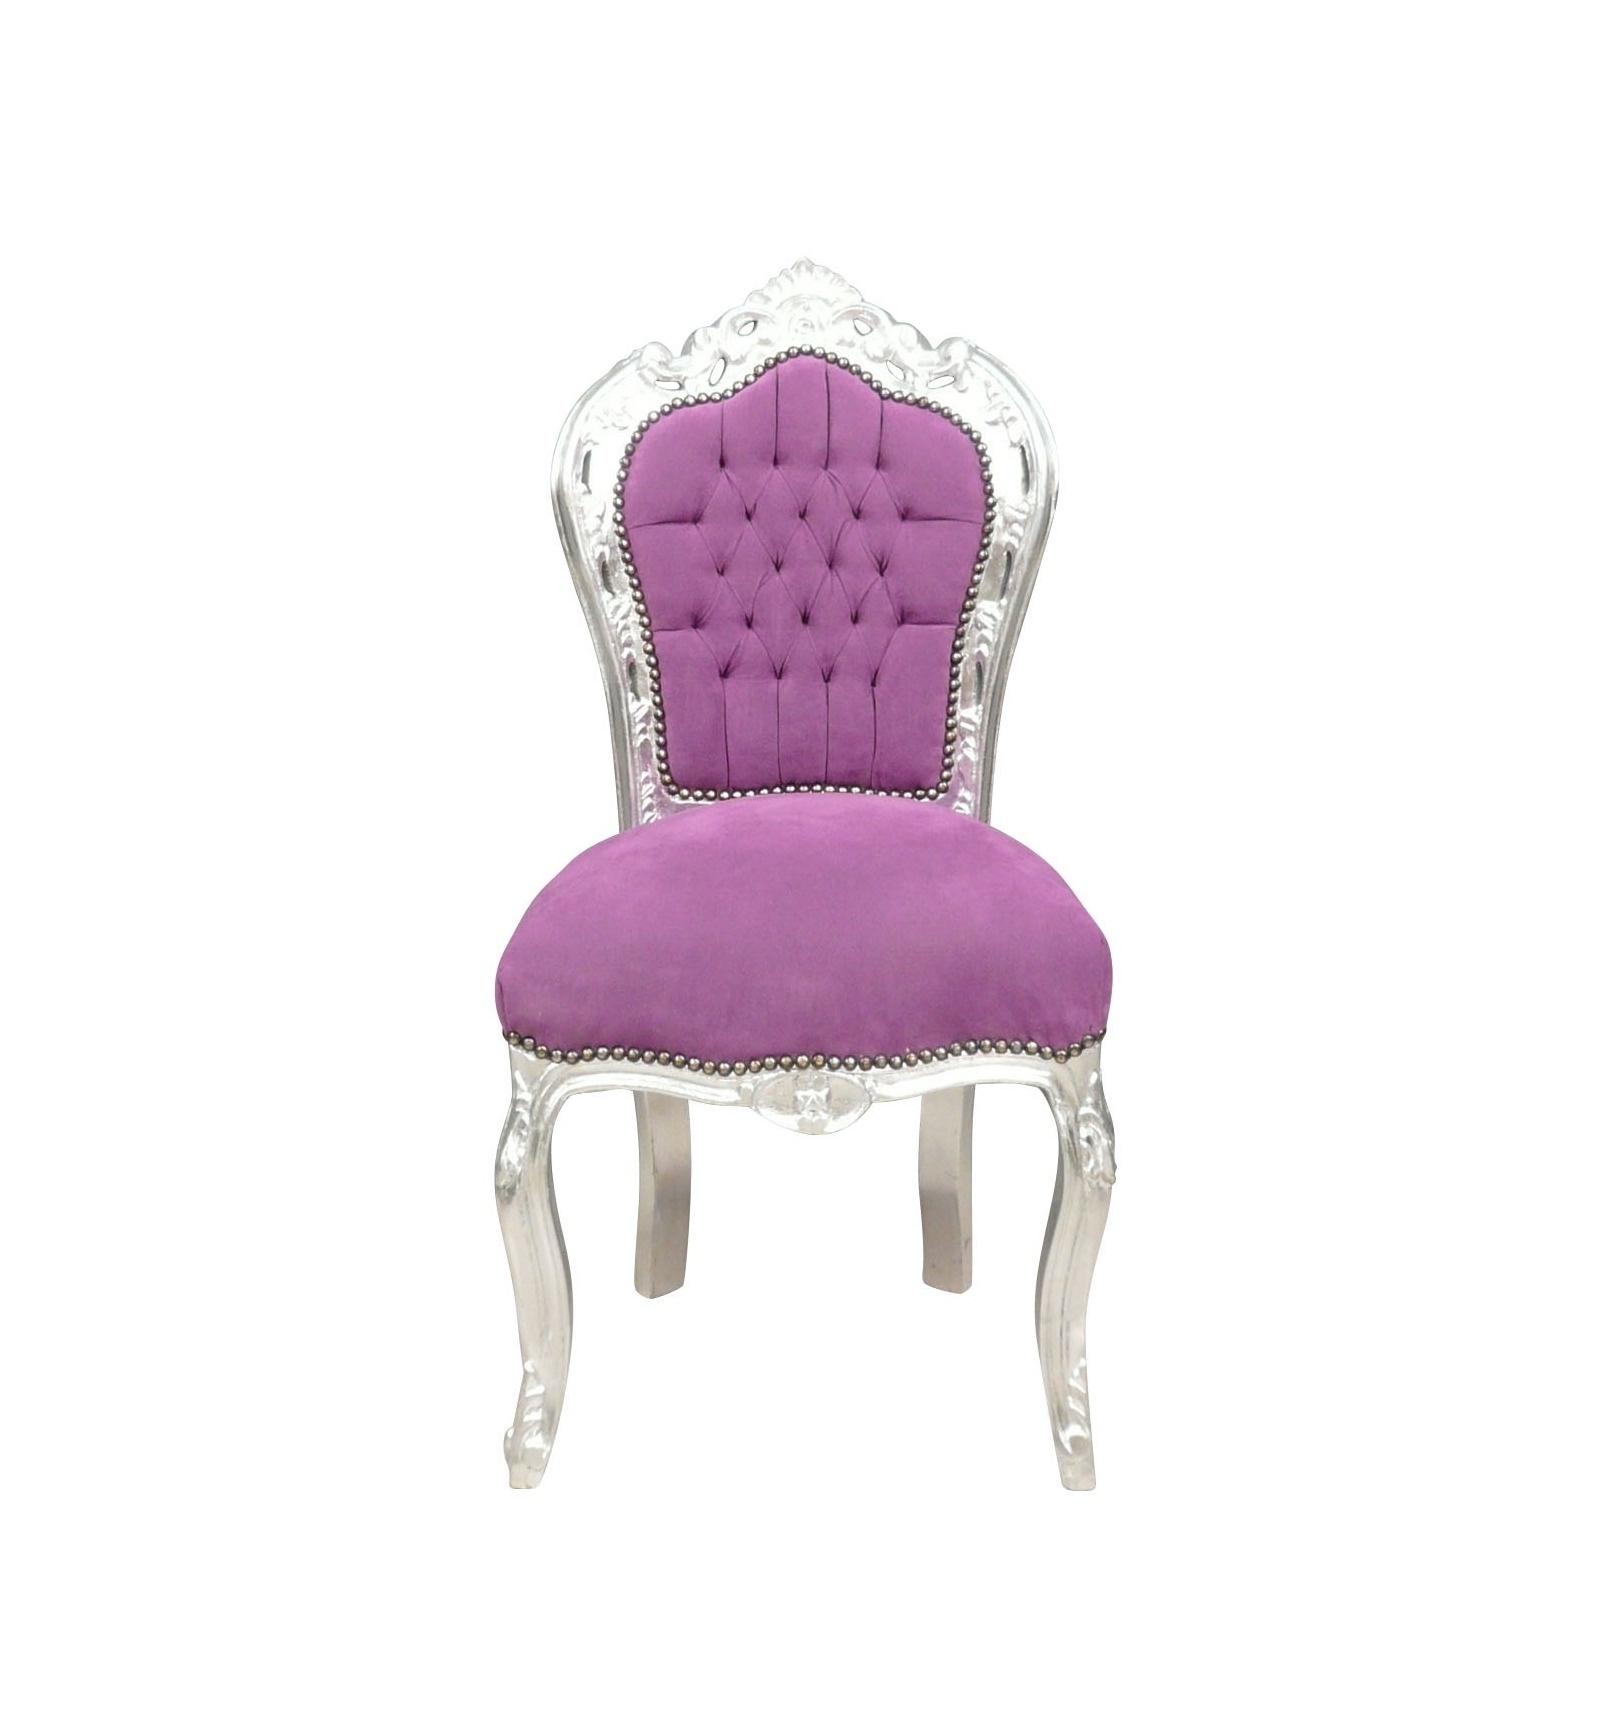 Chaise baroque meubles baroques - Fauteuil rose fushia ...